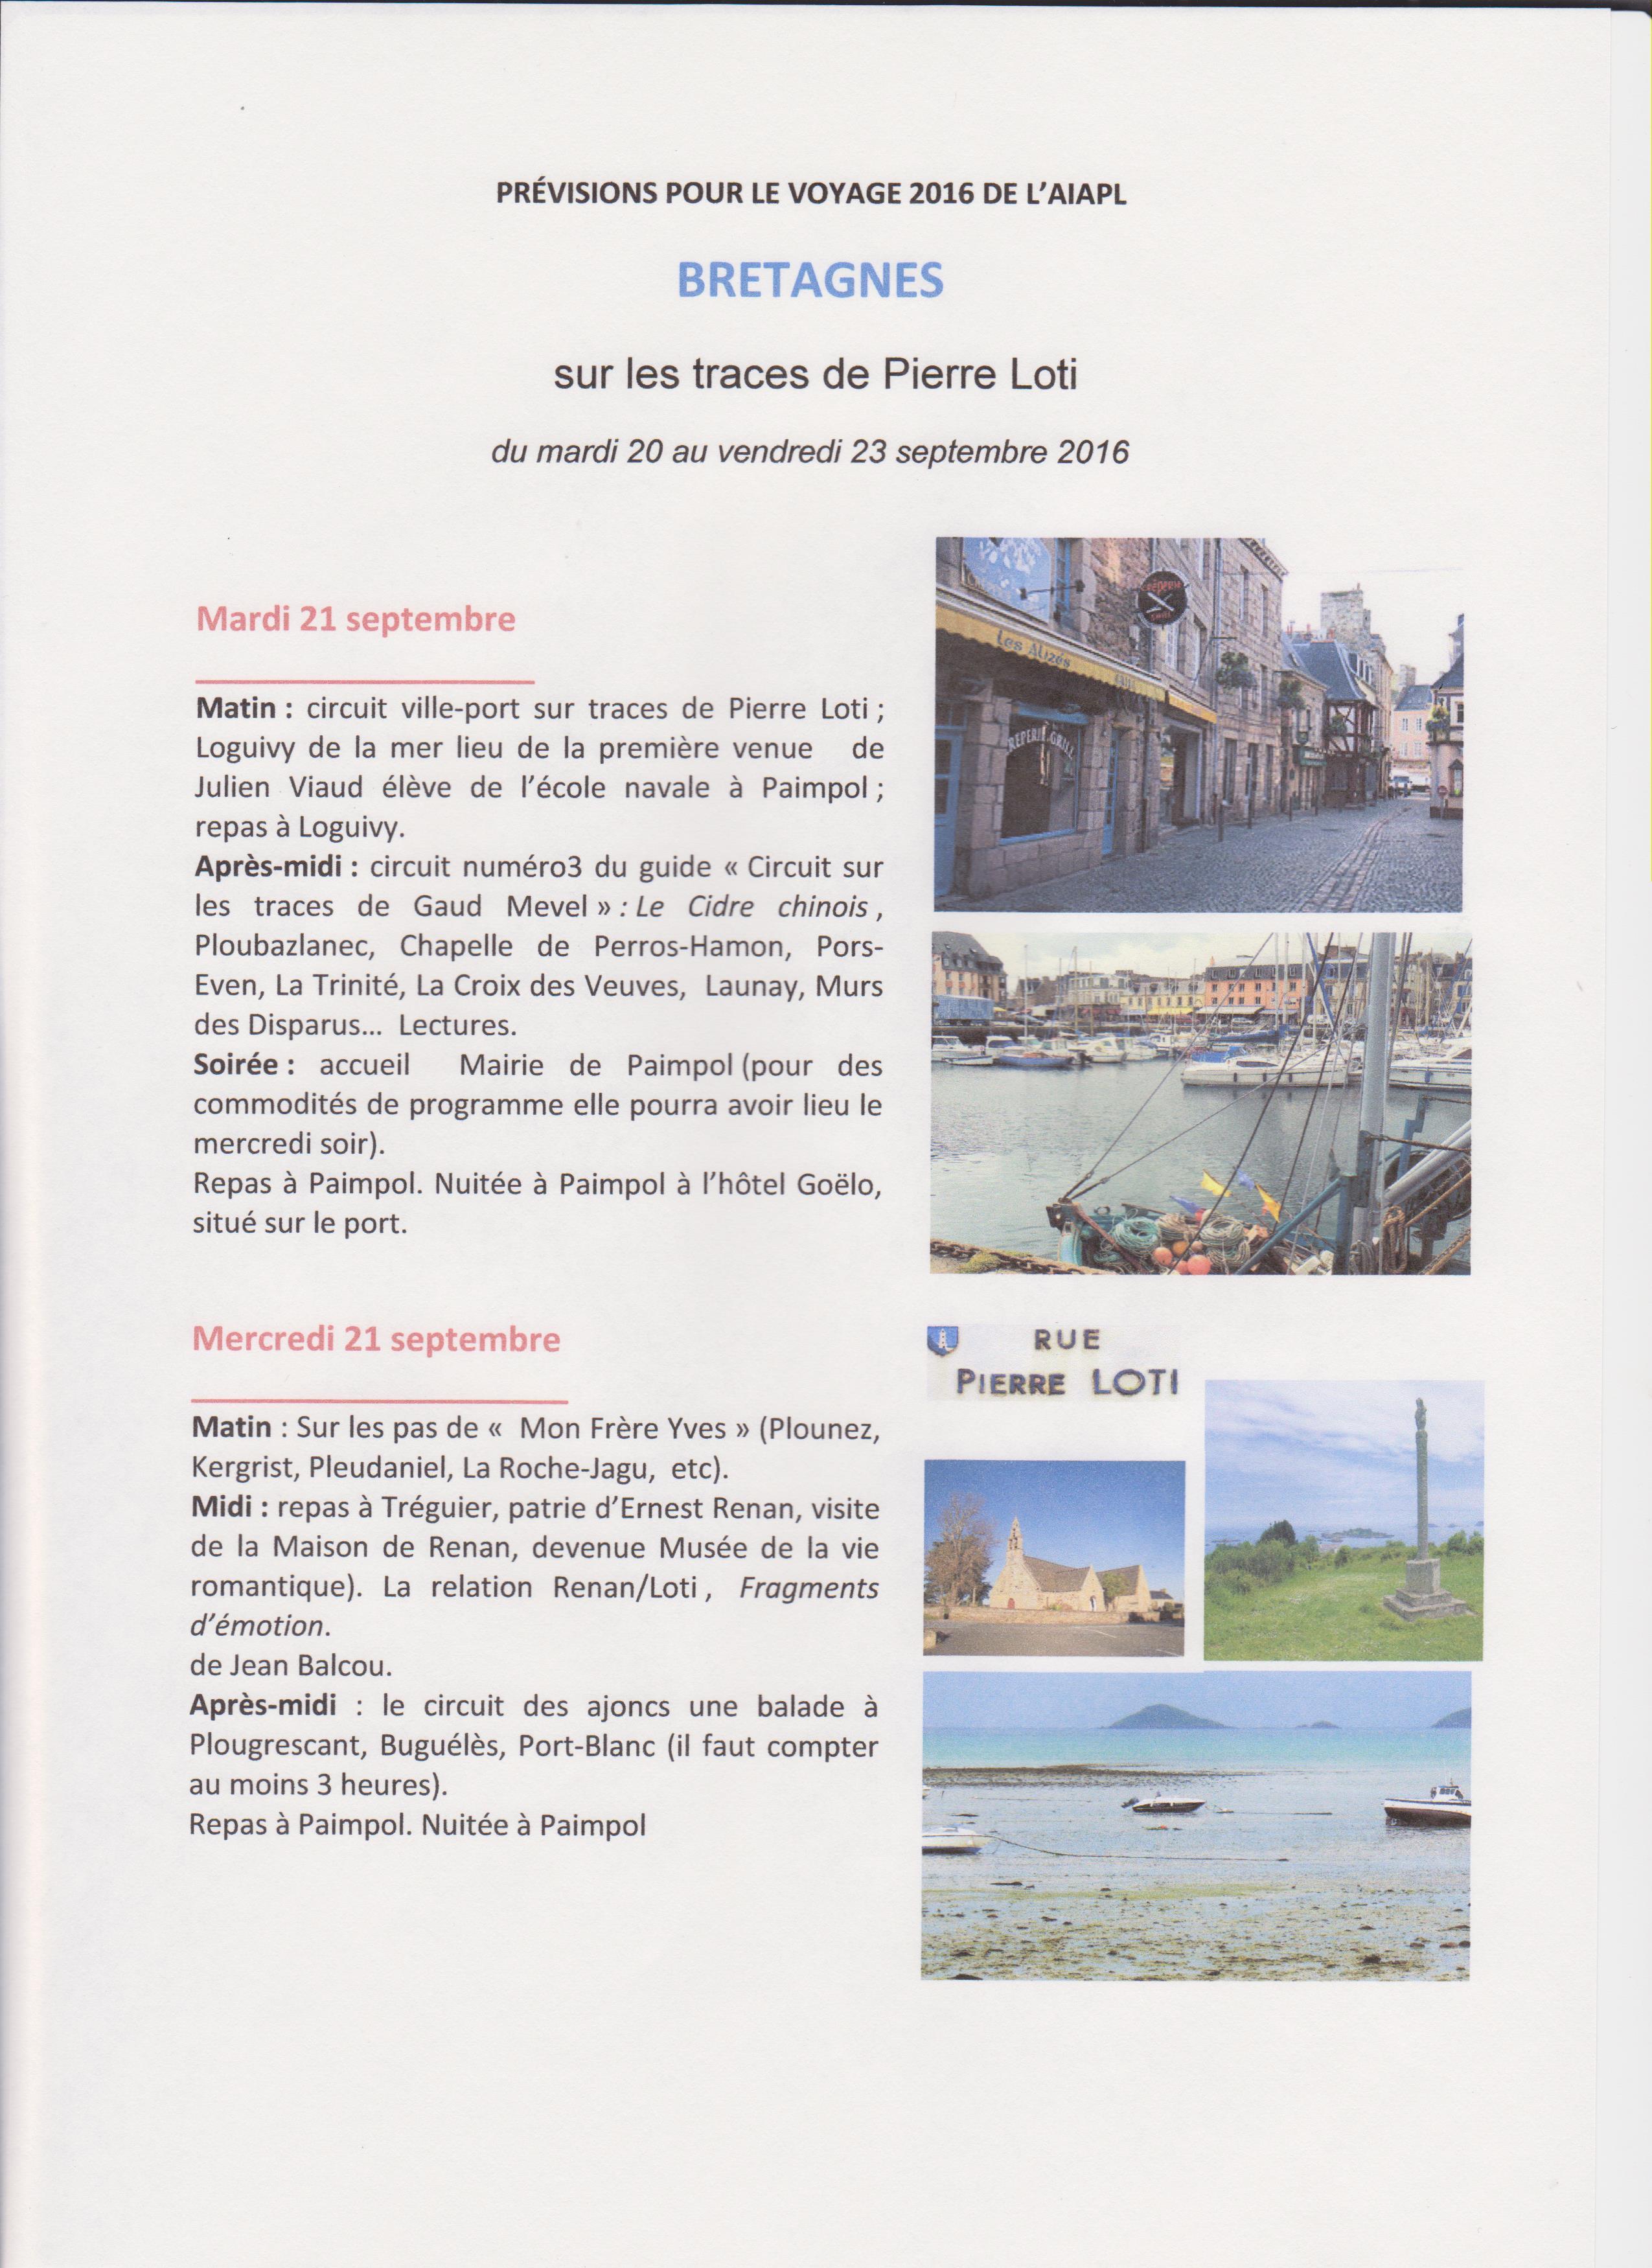 voyage Bretagne 2016 - page 1